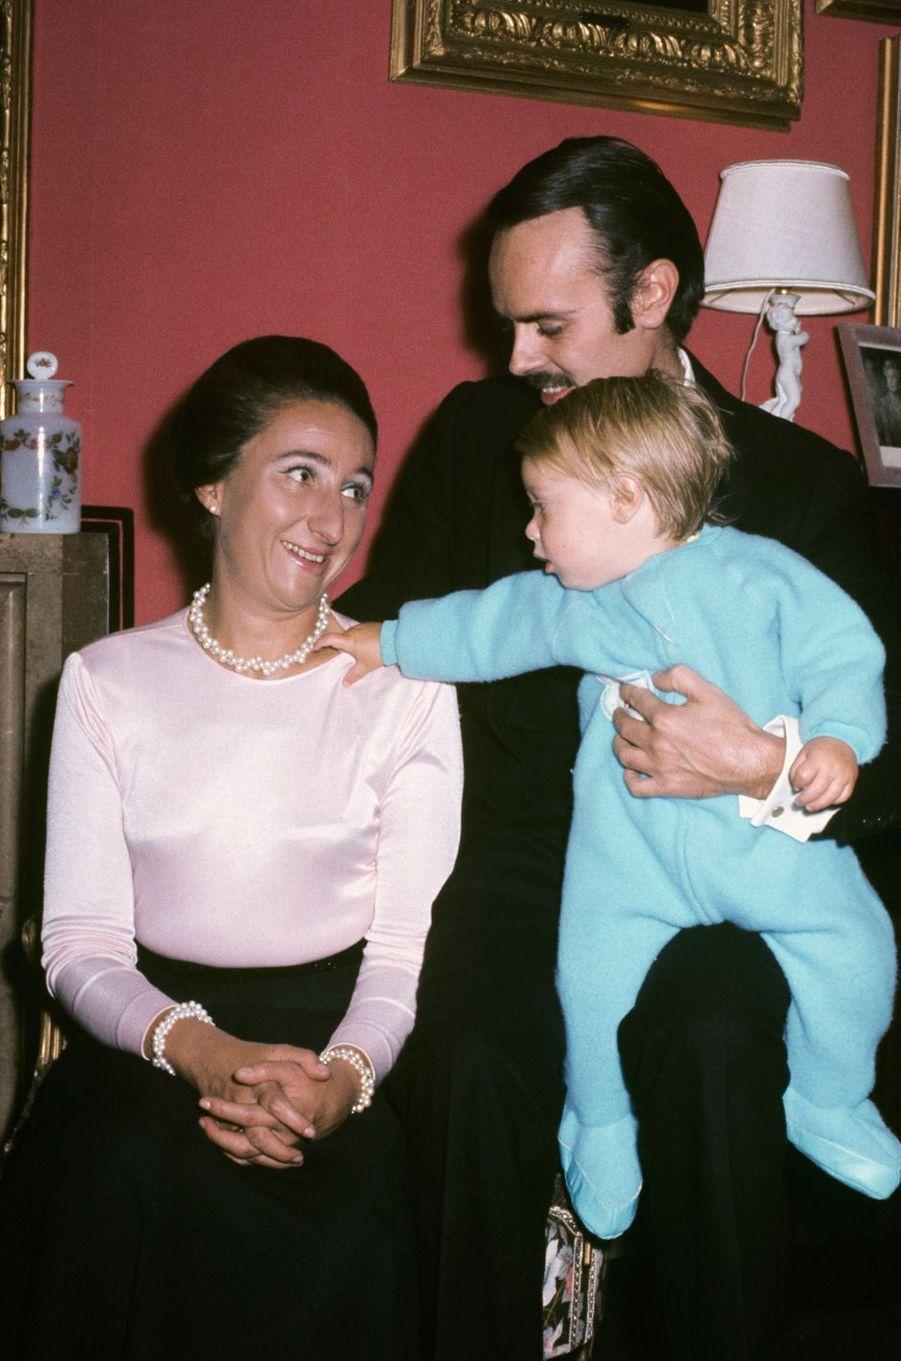 L'infante Margarita d'Espagne et Carlos Zurita avec leur fils Alfonso, en 1974